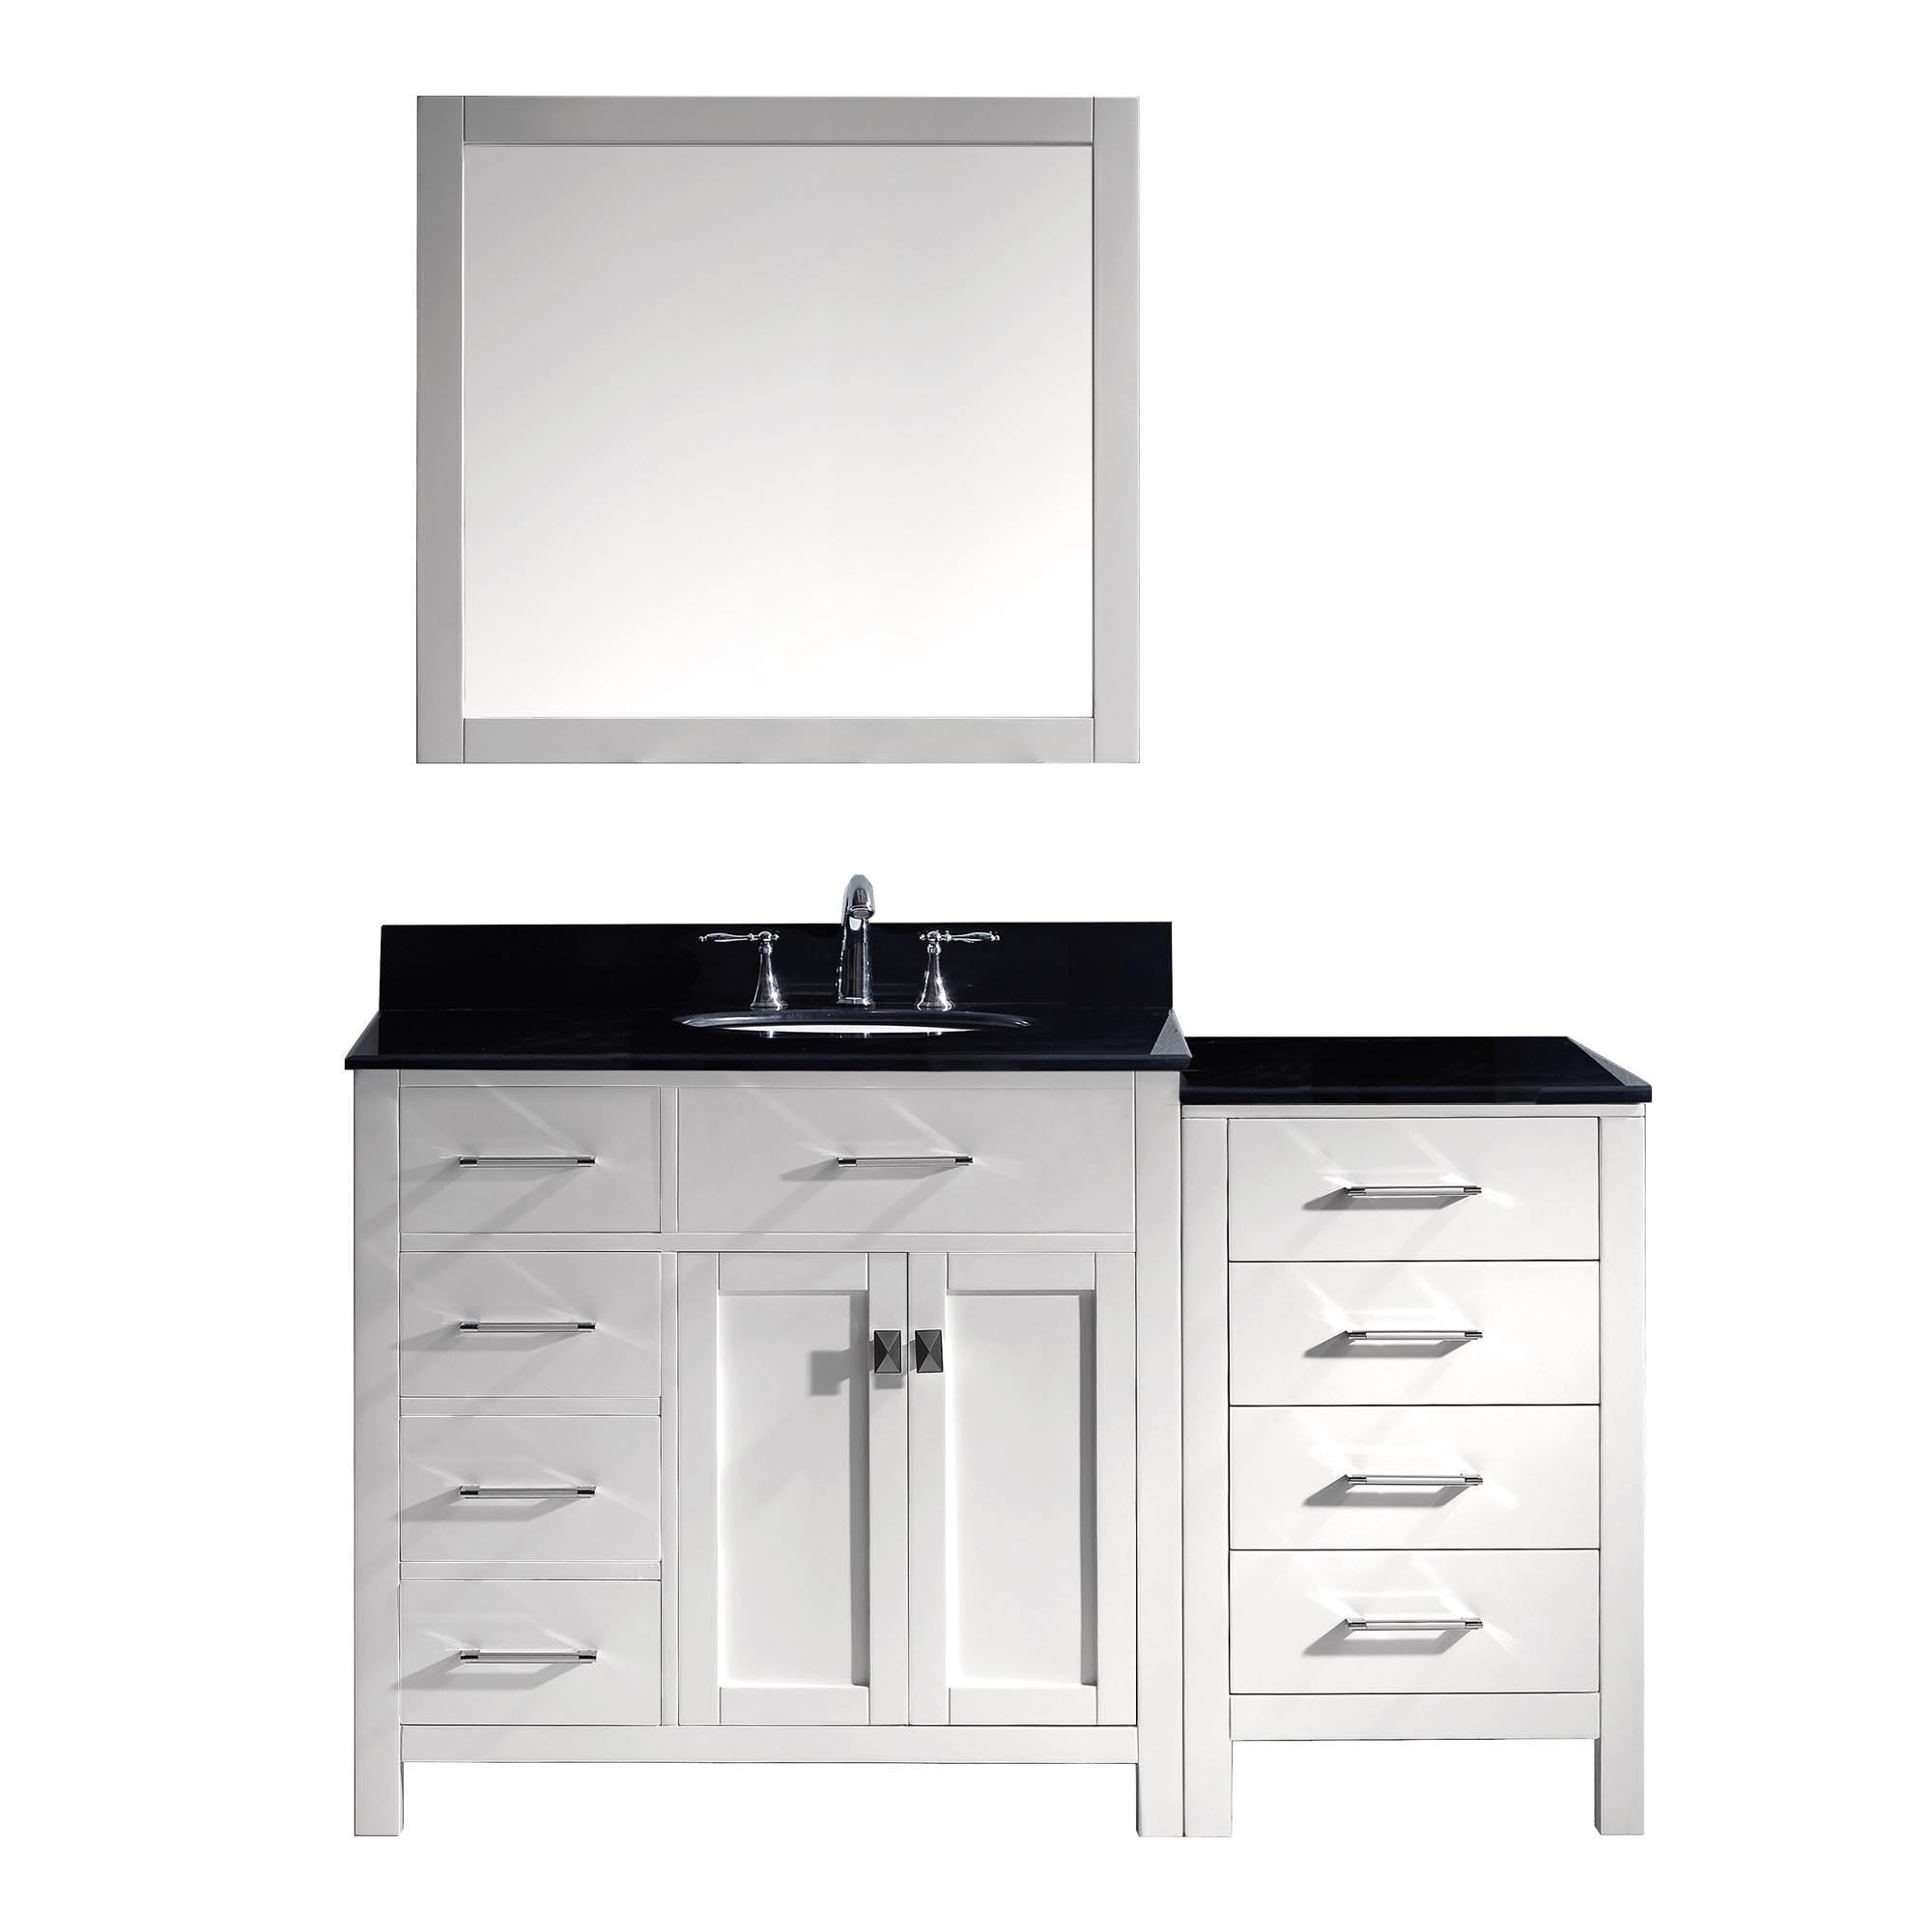 Caroline Parkway 57 Inch Single Left Cabinet Set Bathroom Vanity Free Shipping Today 11352089